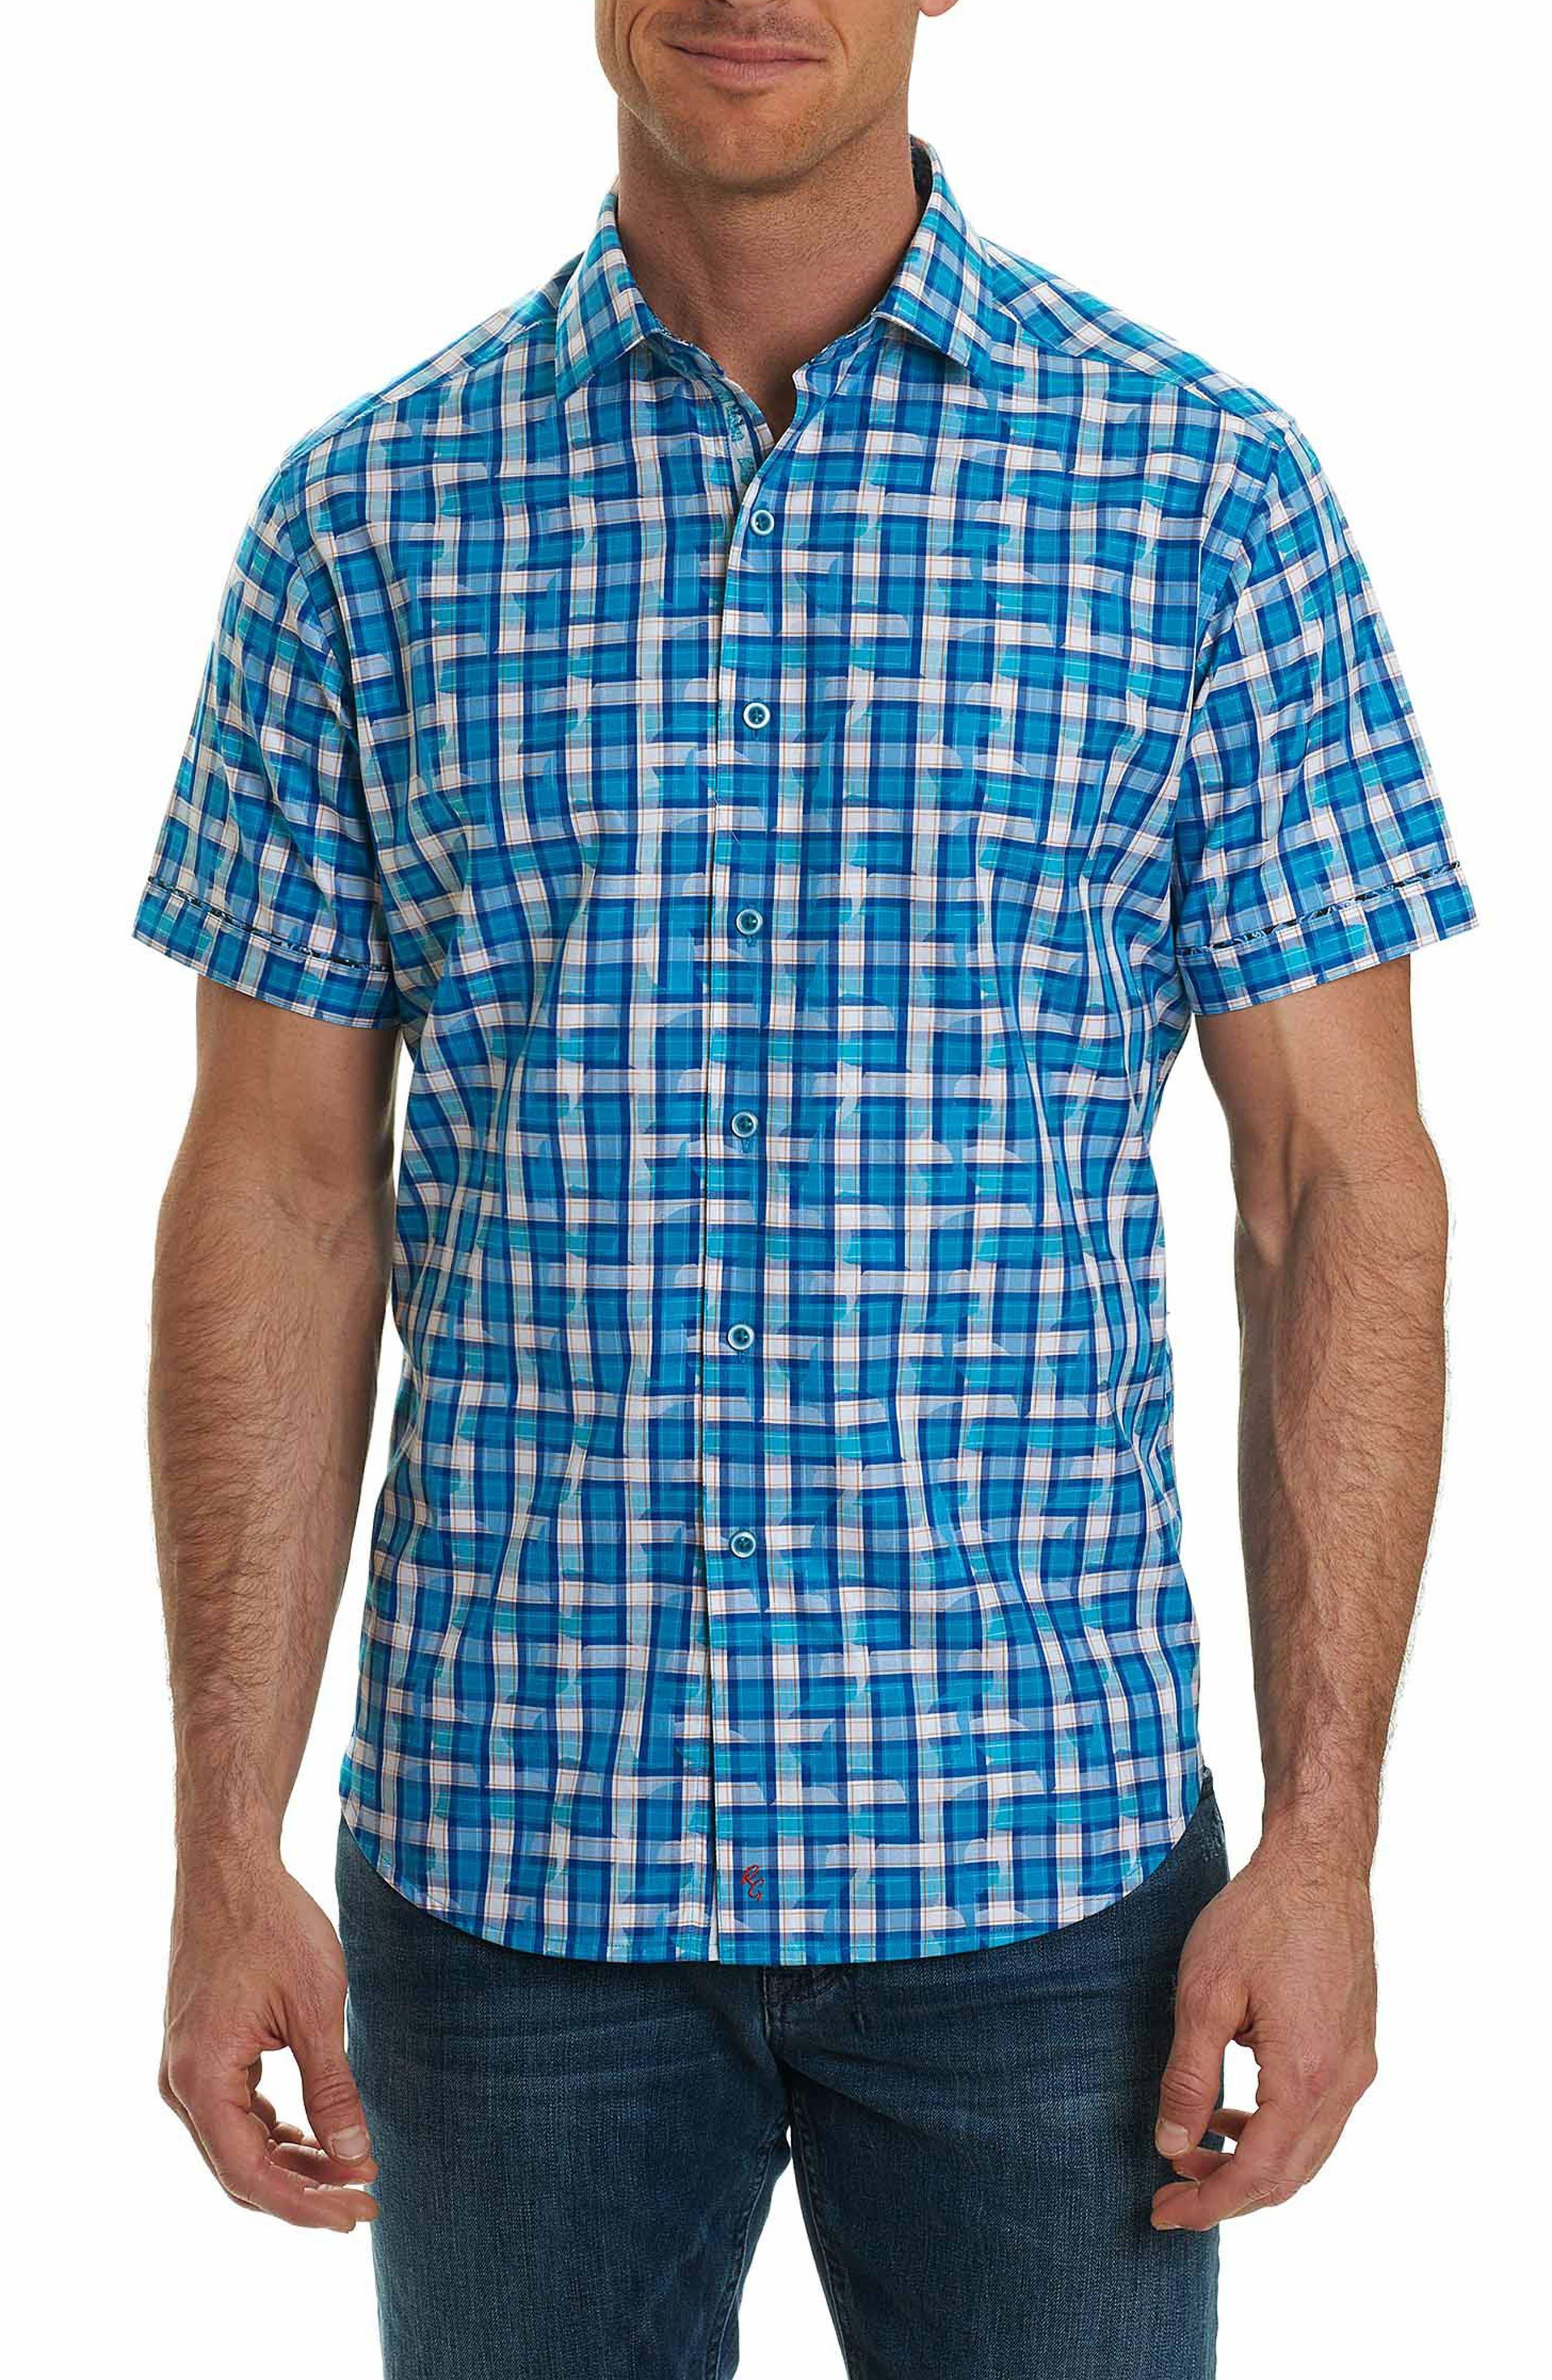 Tangier Classic Fit Print Sport Shirt,                             Main thumbnail 1, color,                             Teal